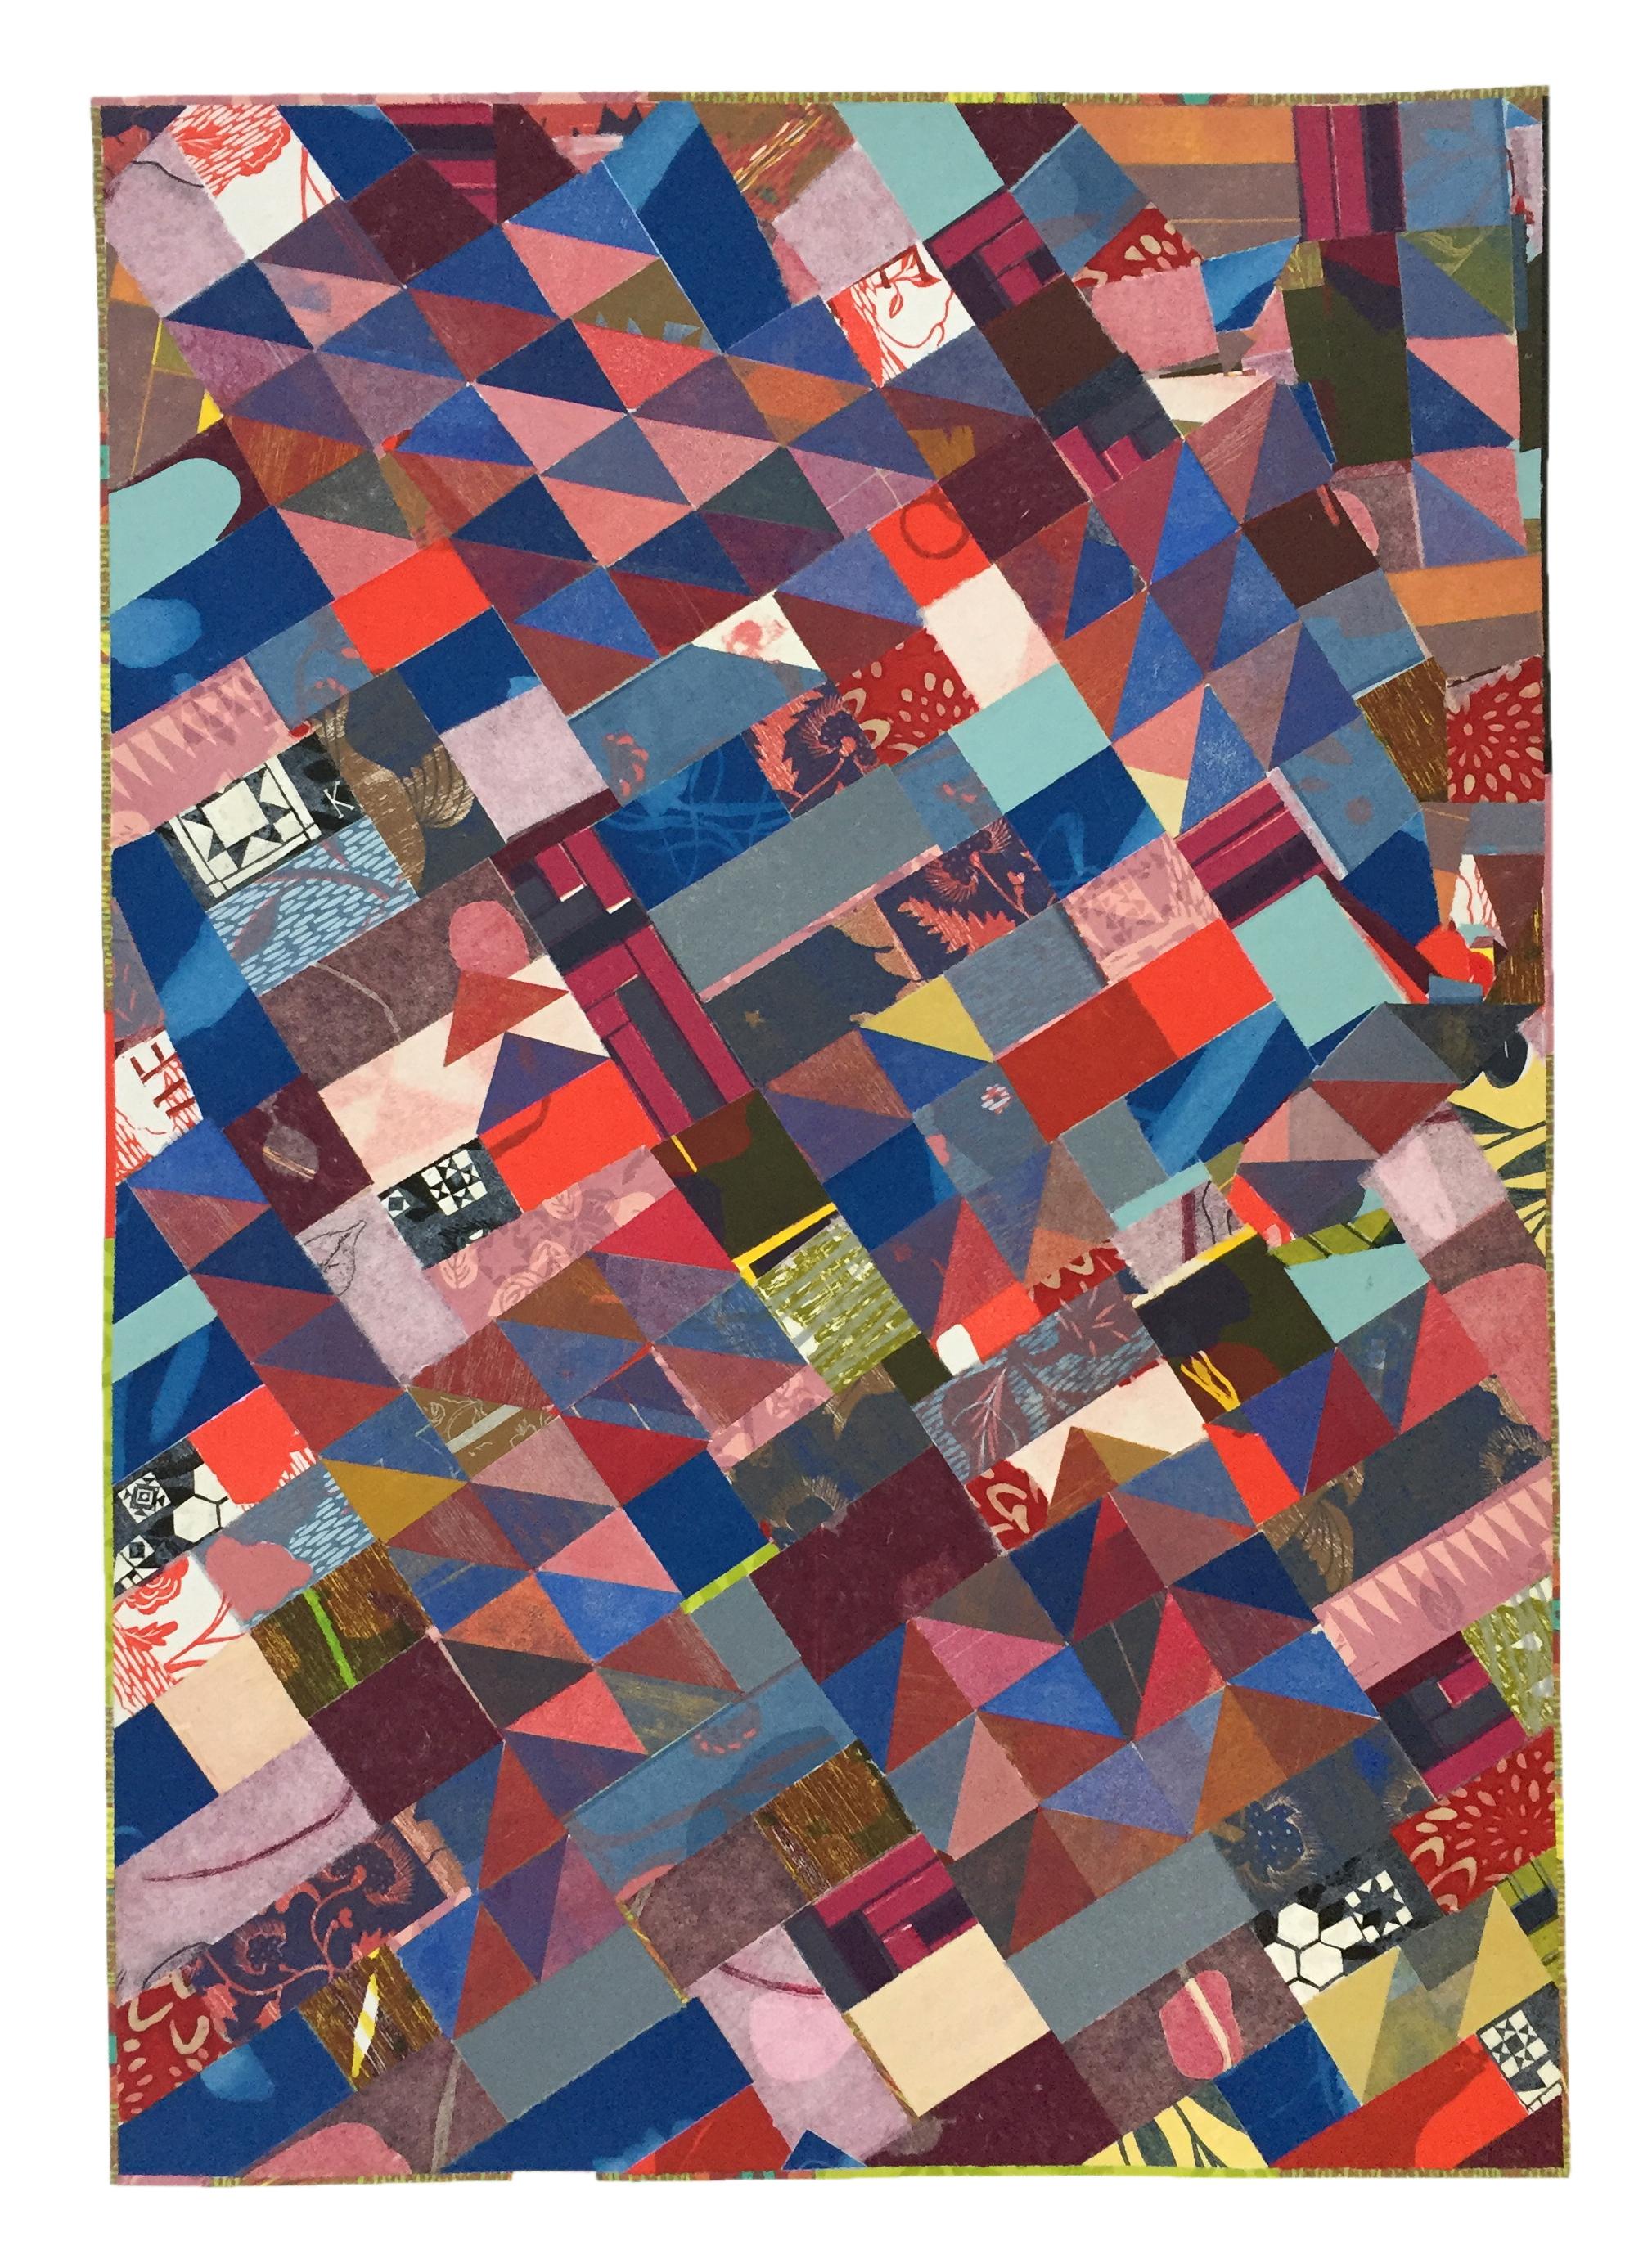 Paper quilt #4